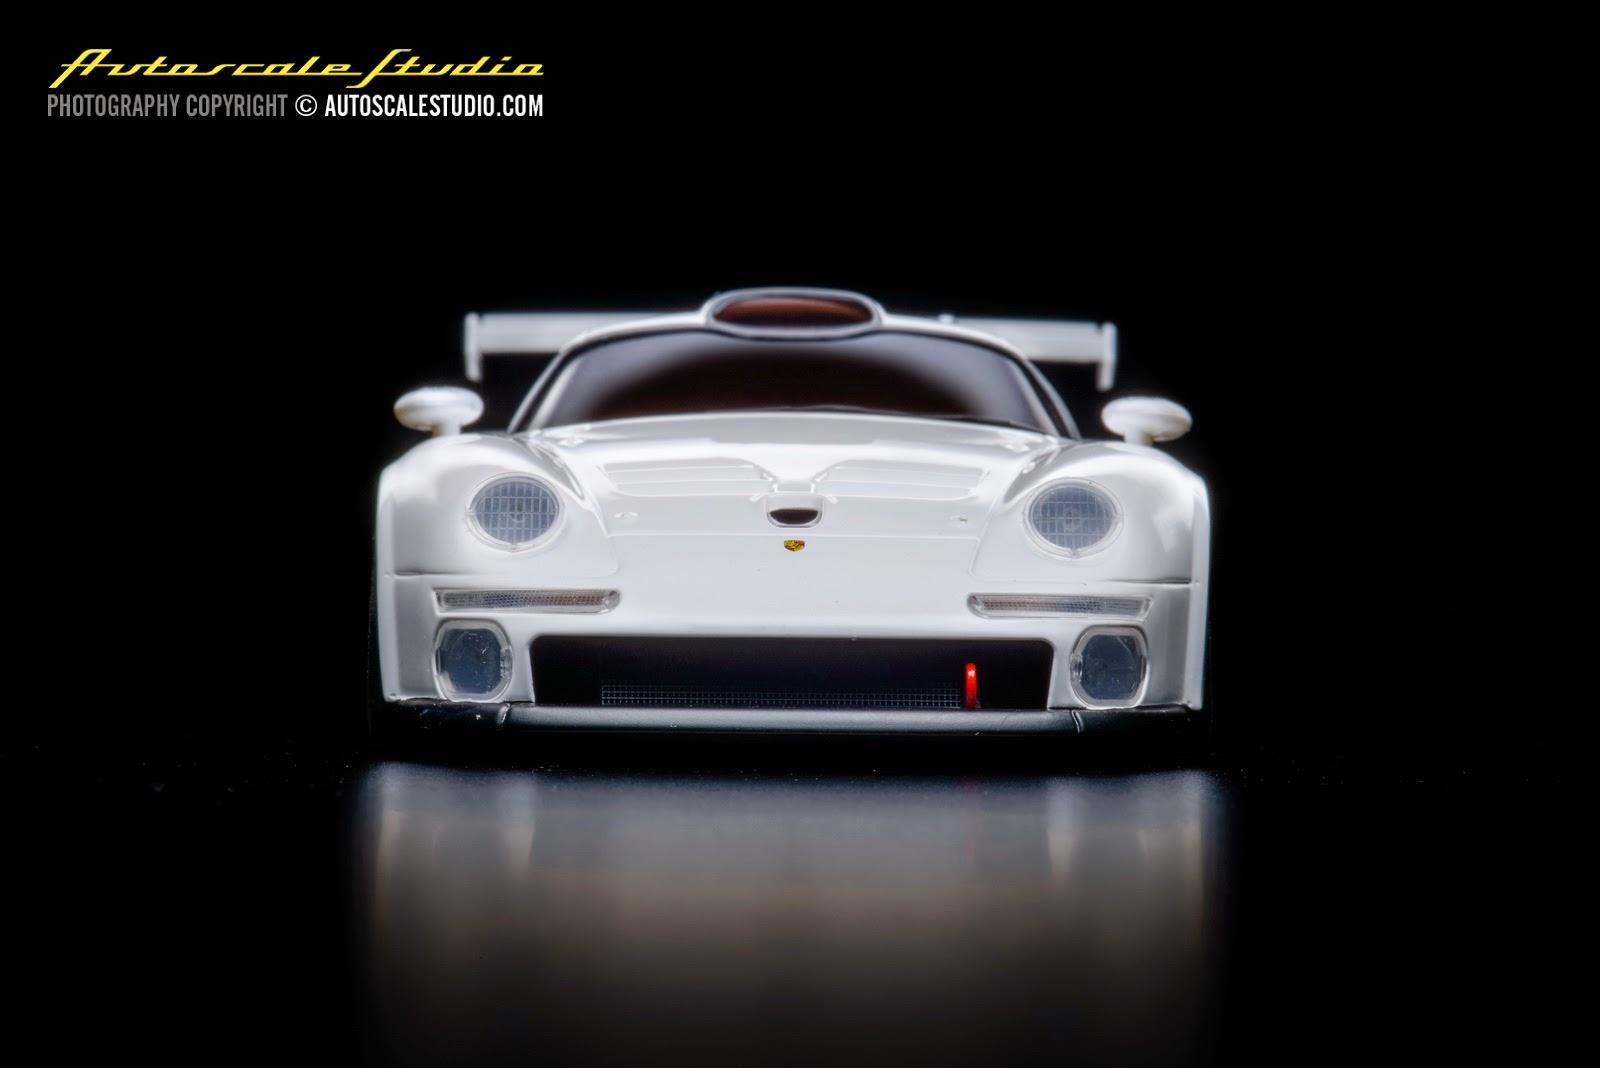 mzp330w porsche 911 gt1 white autoscale studio. Black Bedroom Furniture Sets. Home Design Ideas